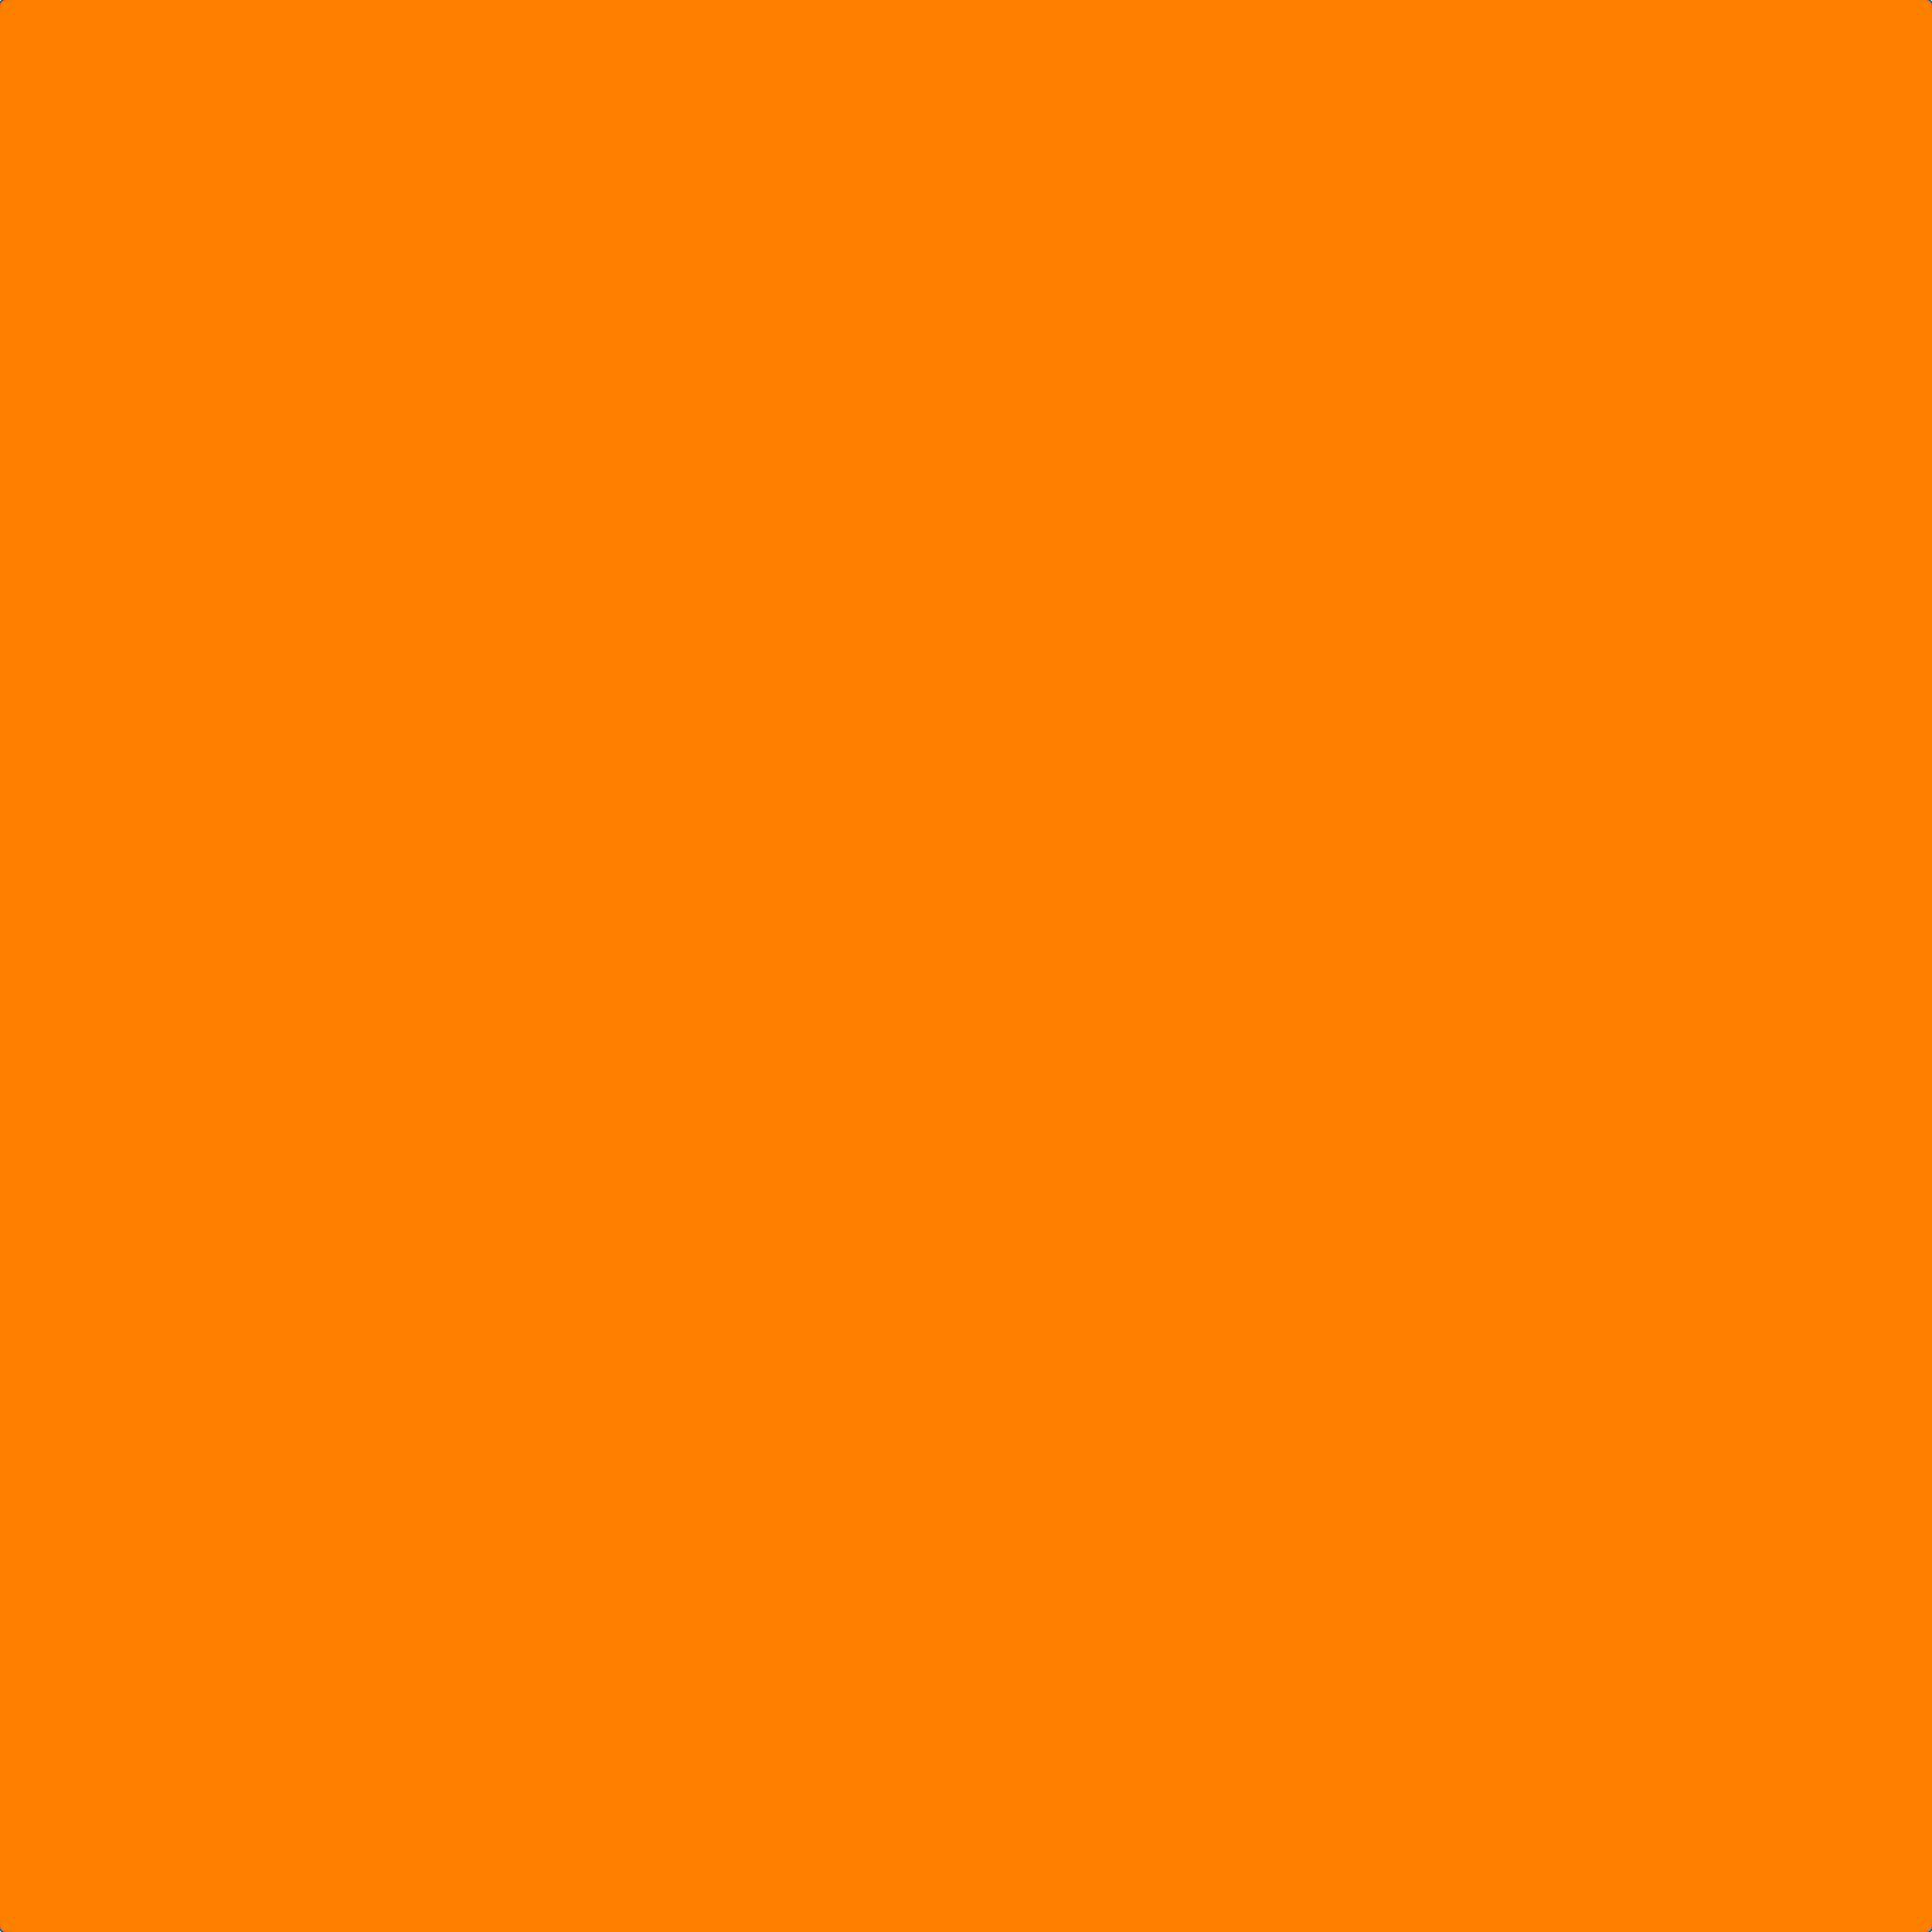 Neon Orange Backgrounds